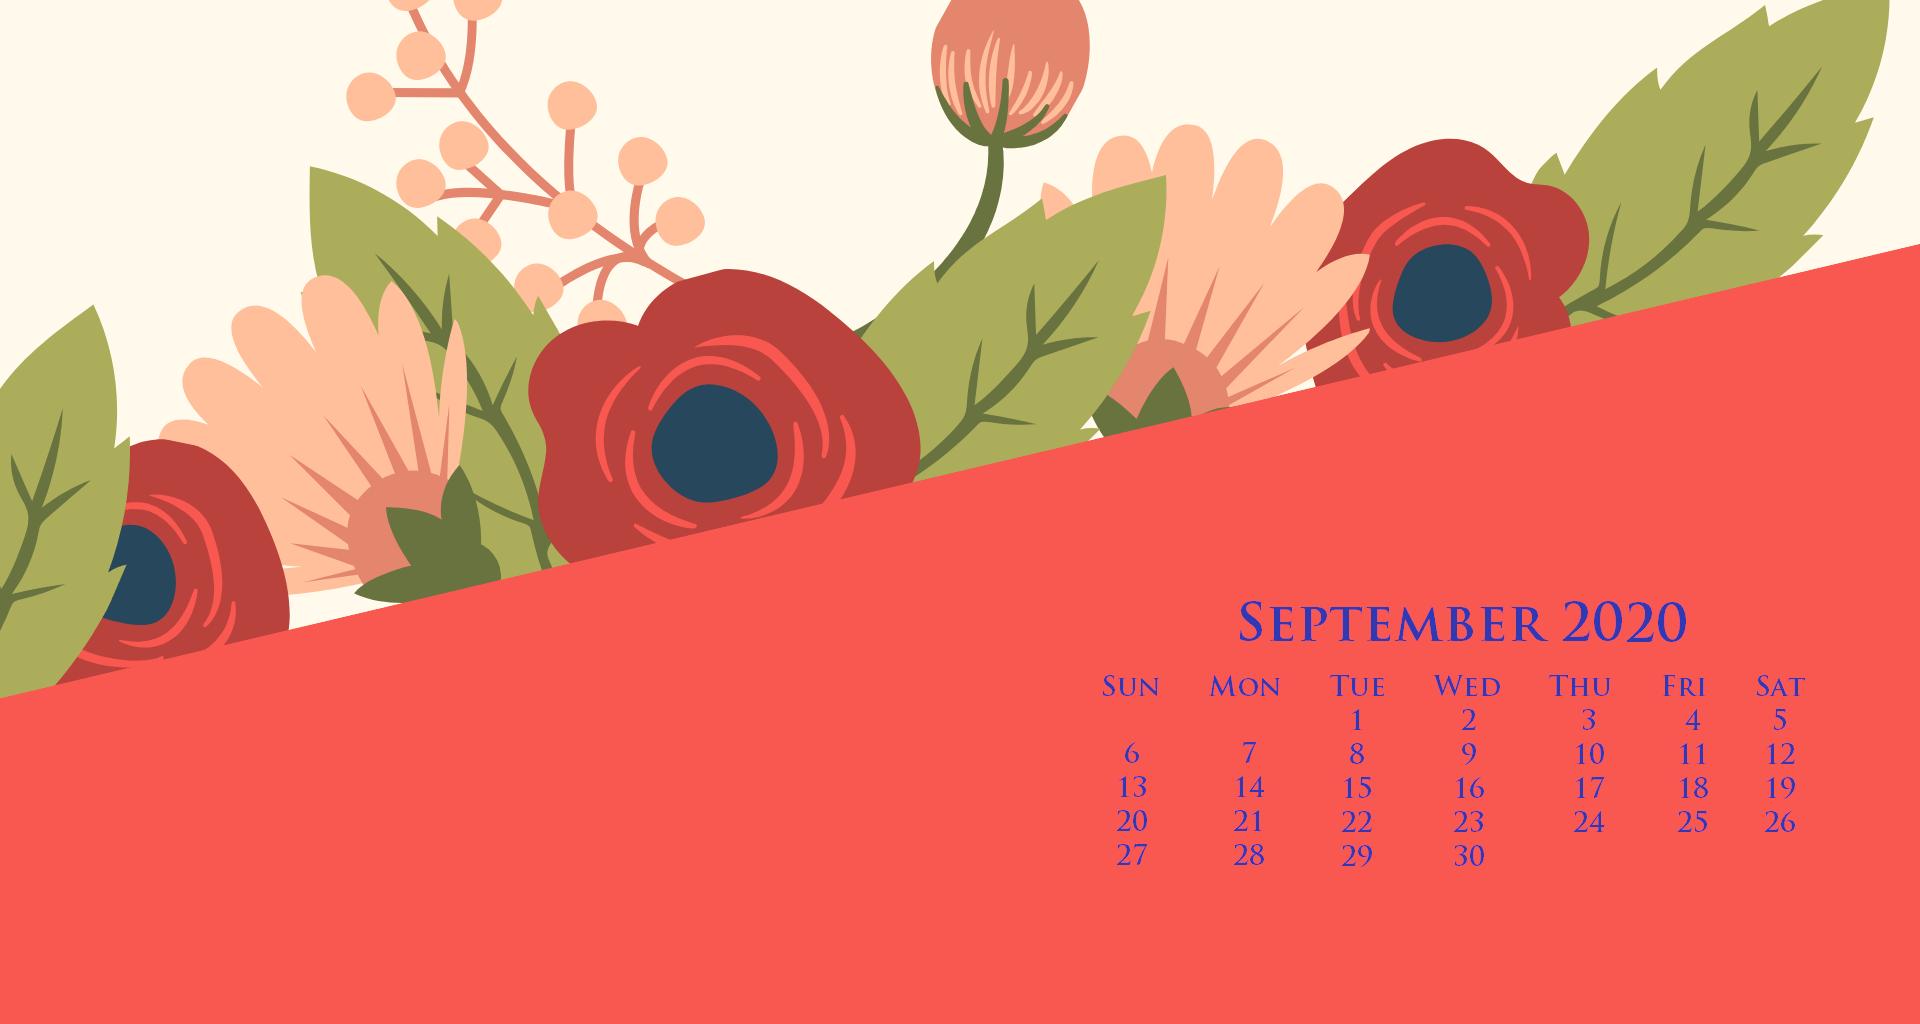 September 2020 Floral Wallpaper